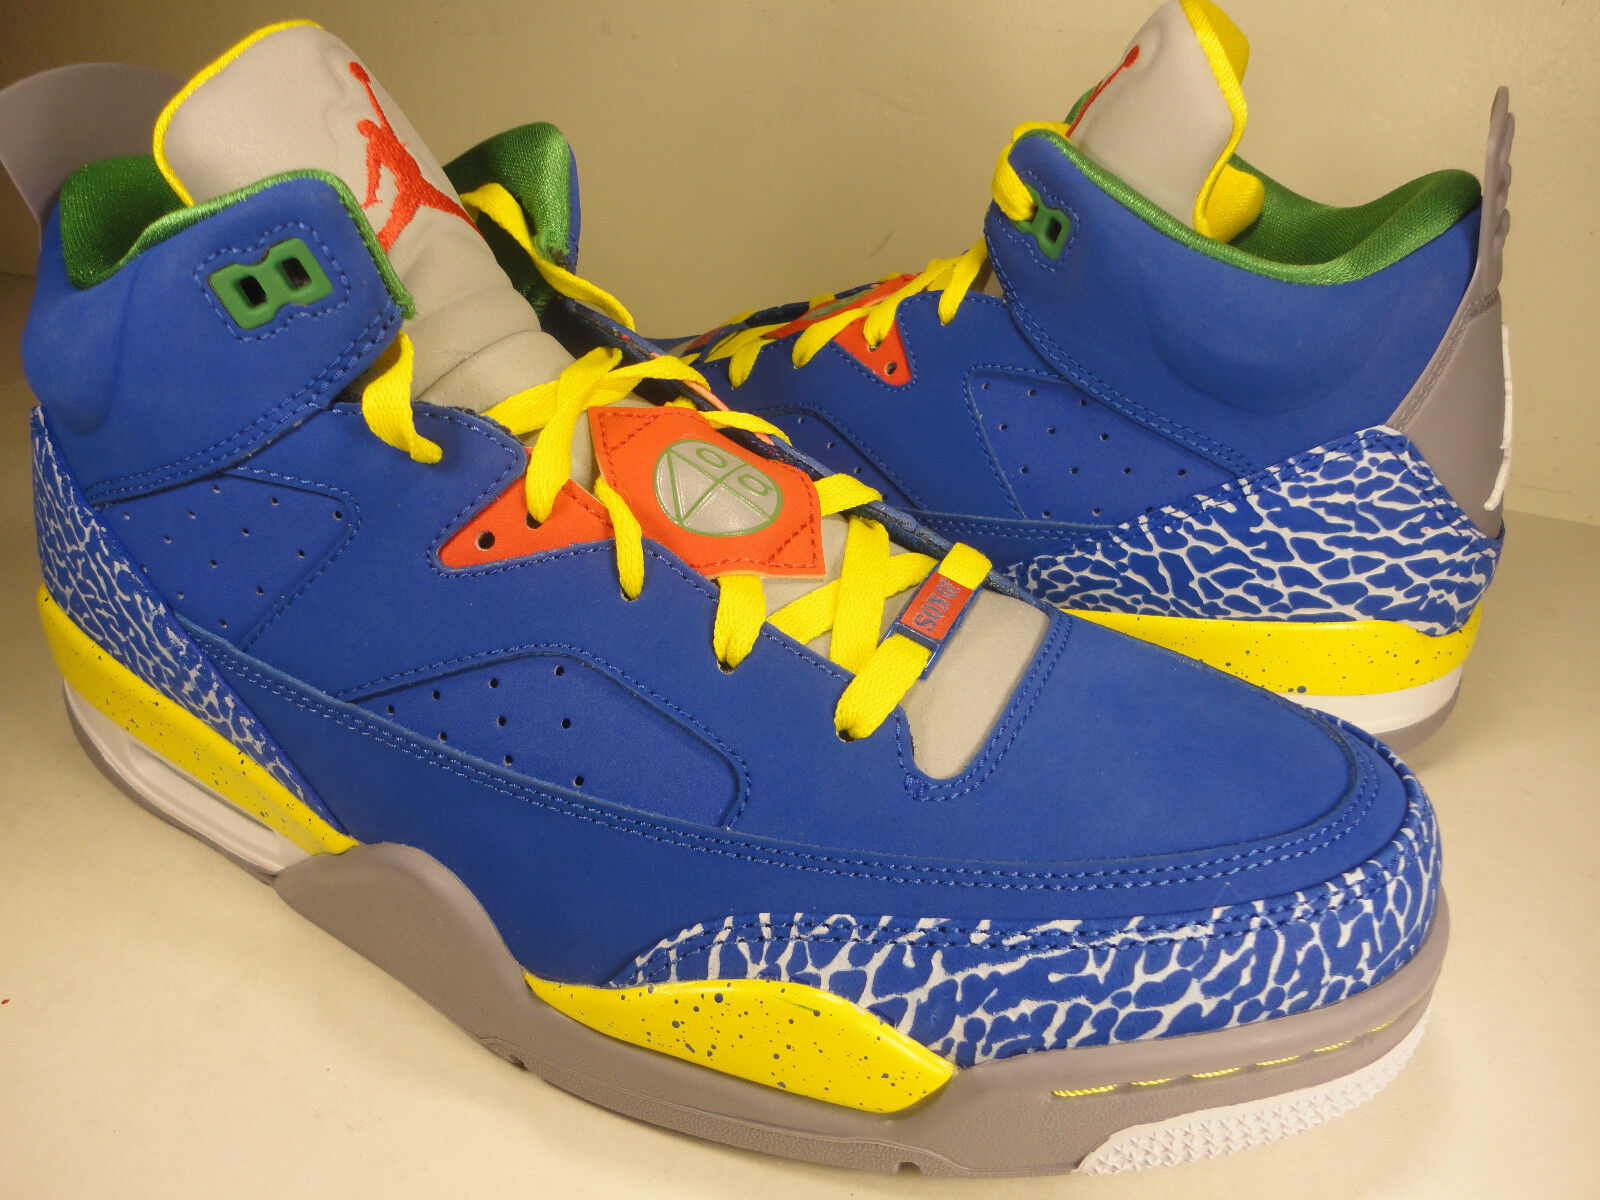 Nike Air Jordan Son Of Low Do The Right SZ Thing White Blue Grey SZ Right 14 (580603-433) d2b9e0